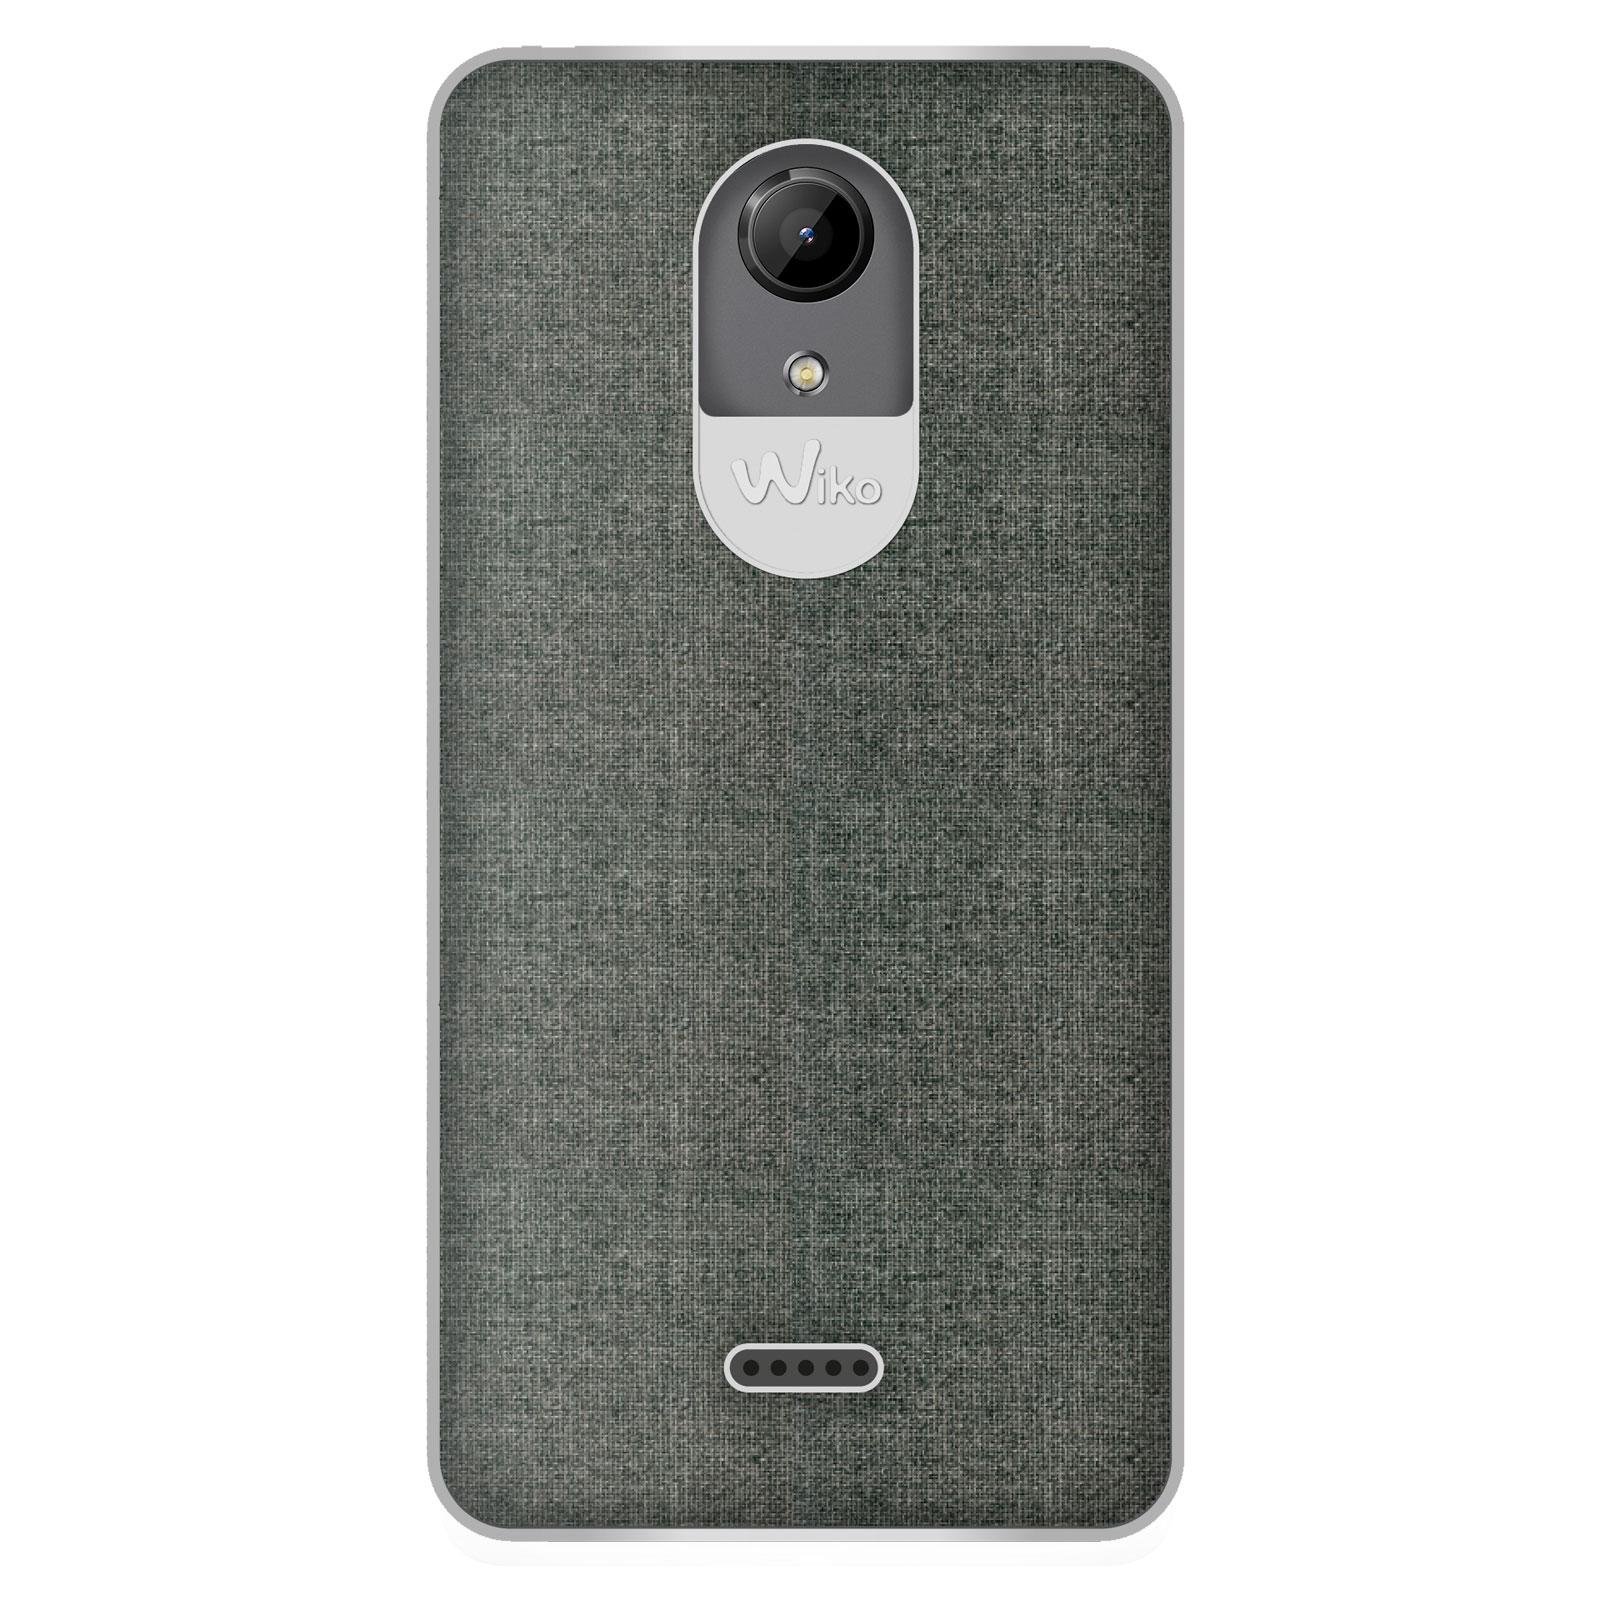 Wiko coque tissu wiboard gris wiko ufeel lite etui t l phone wiko sur - Fabriquer une coque de telephone ...